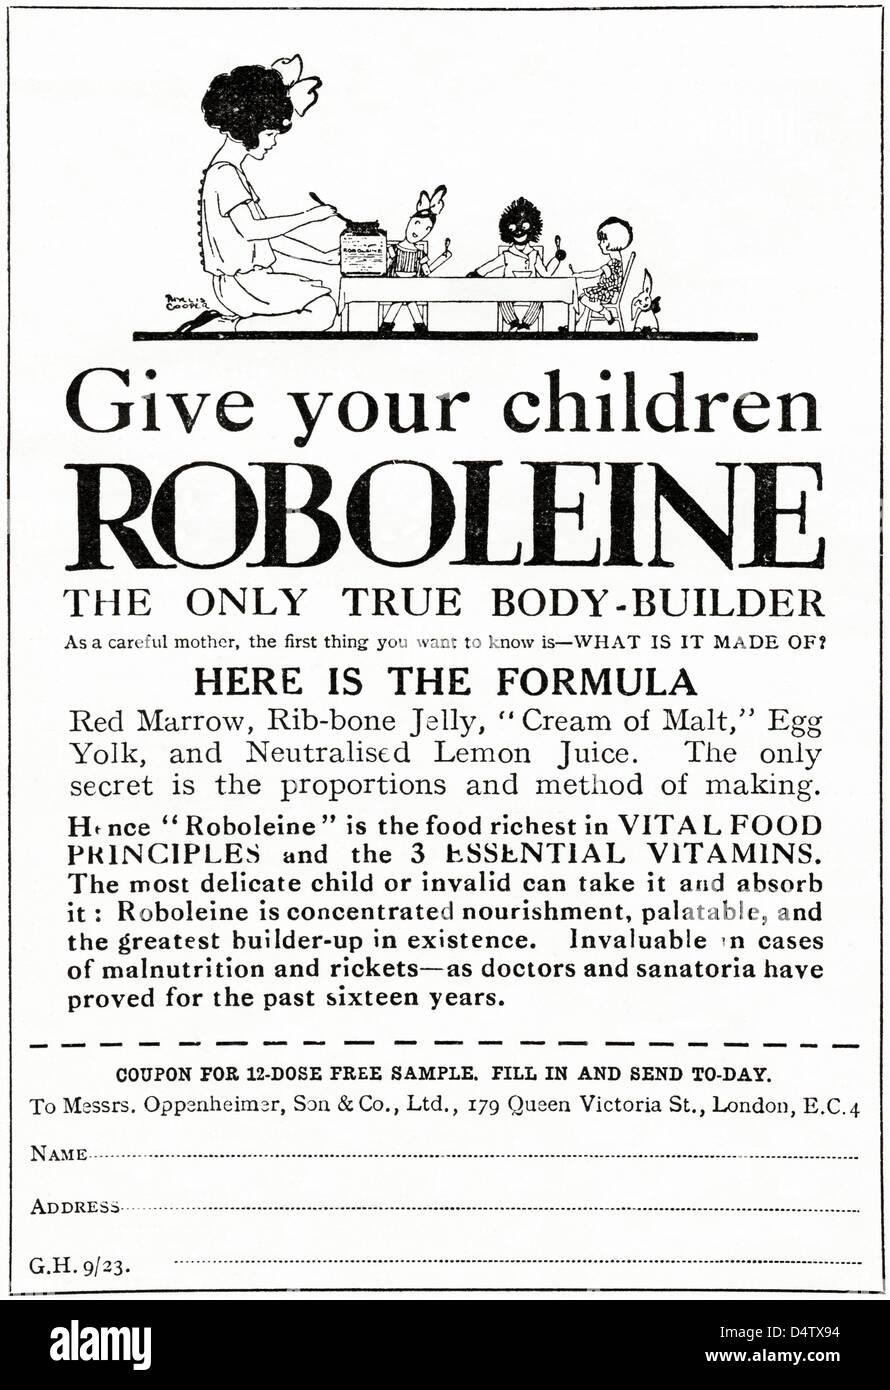 Original 1920s period vintage advertisement print from English magazine advertising ROBOLEINE health food for children - Stock Image